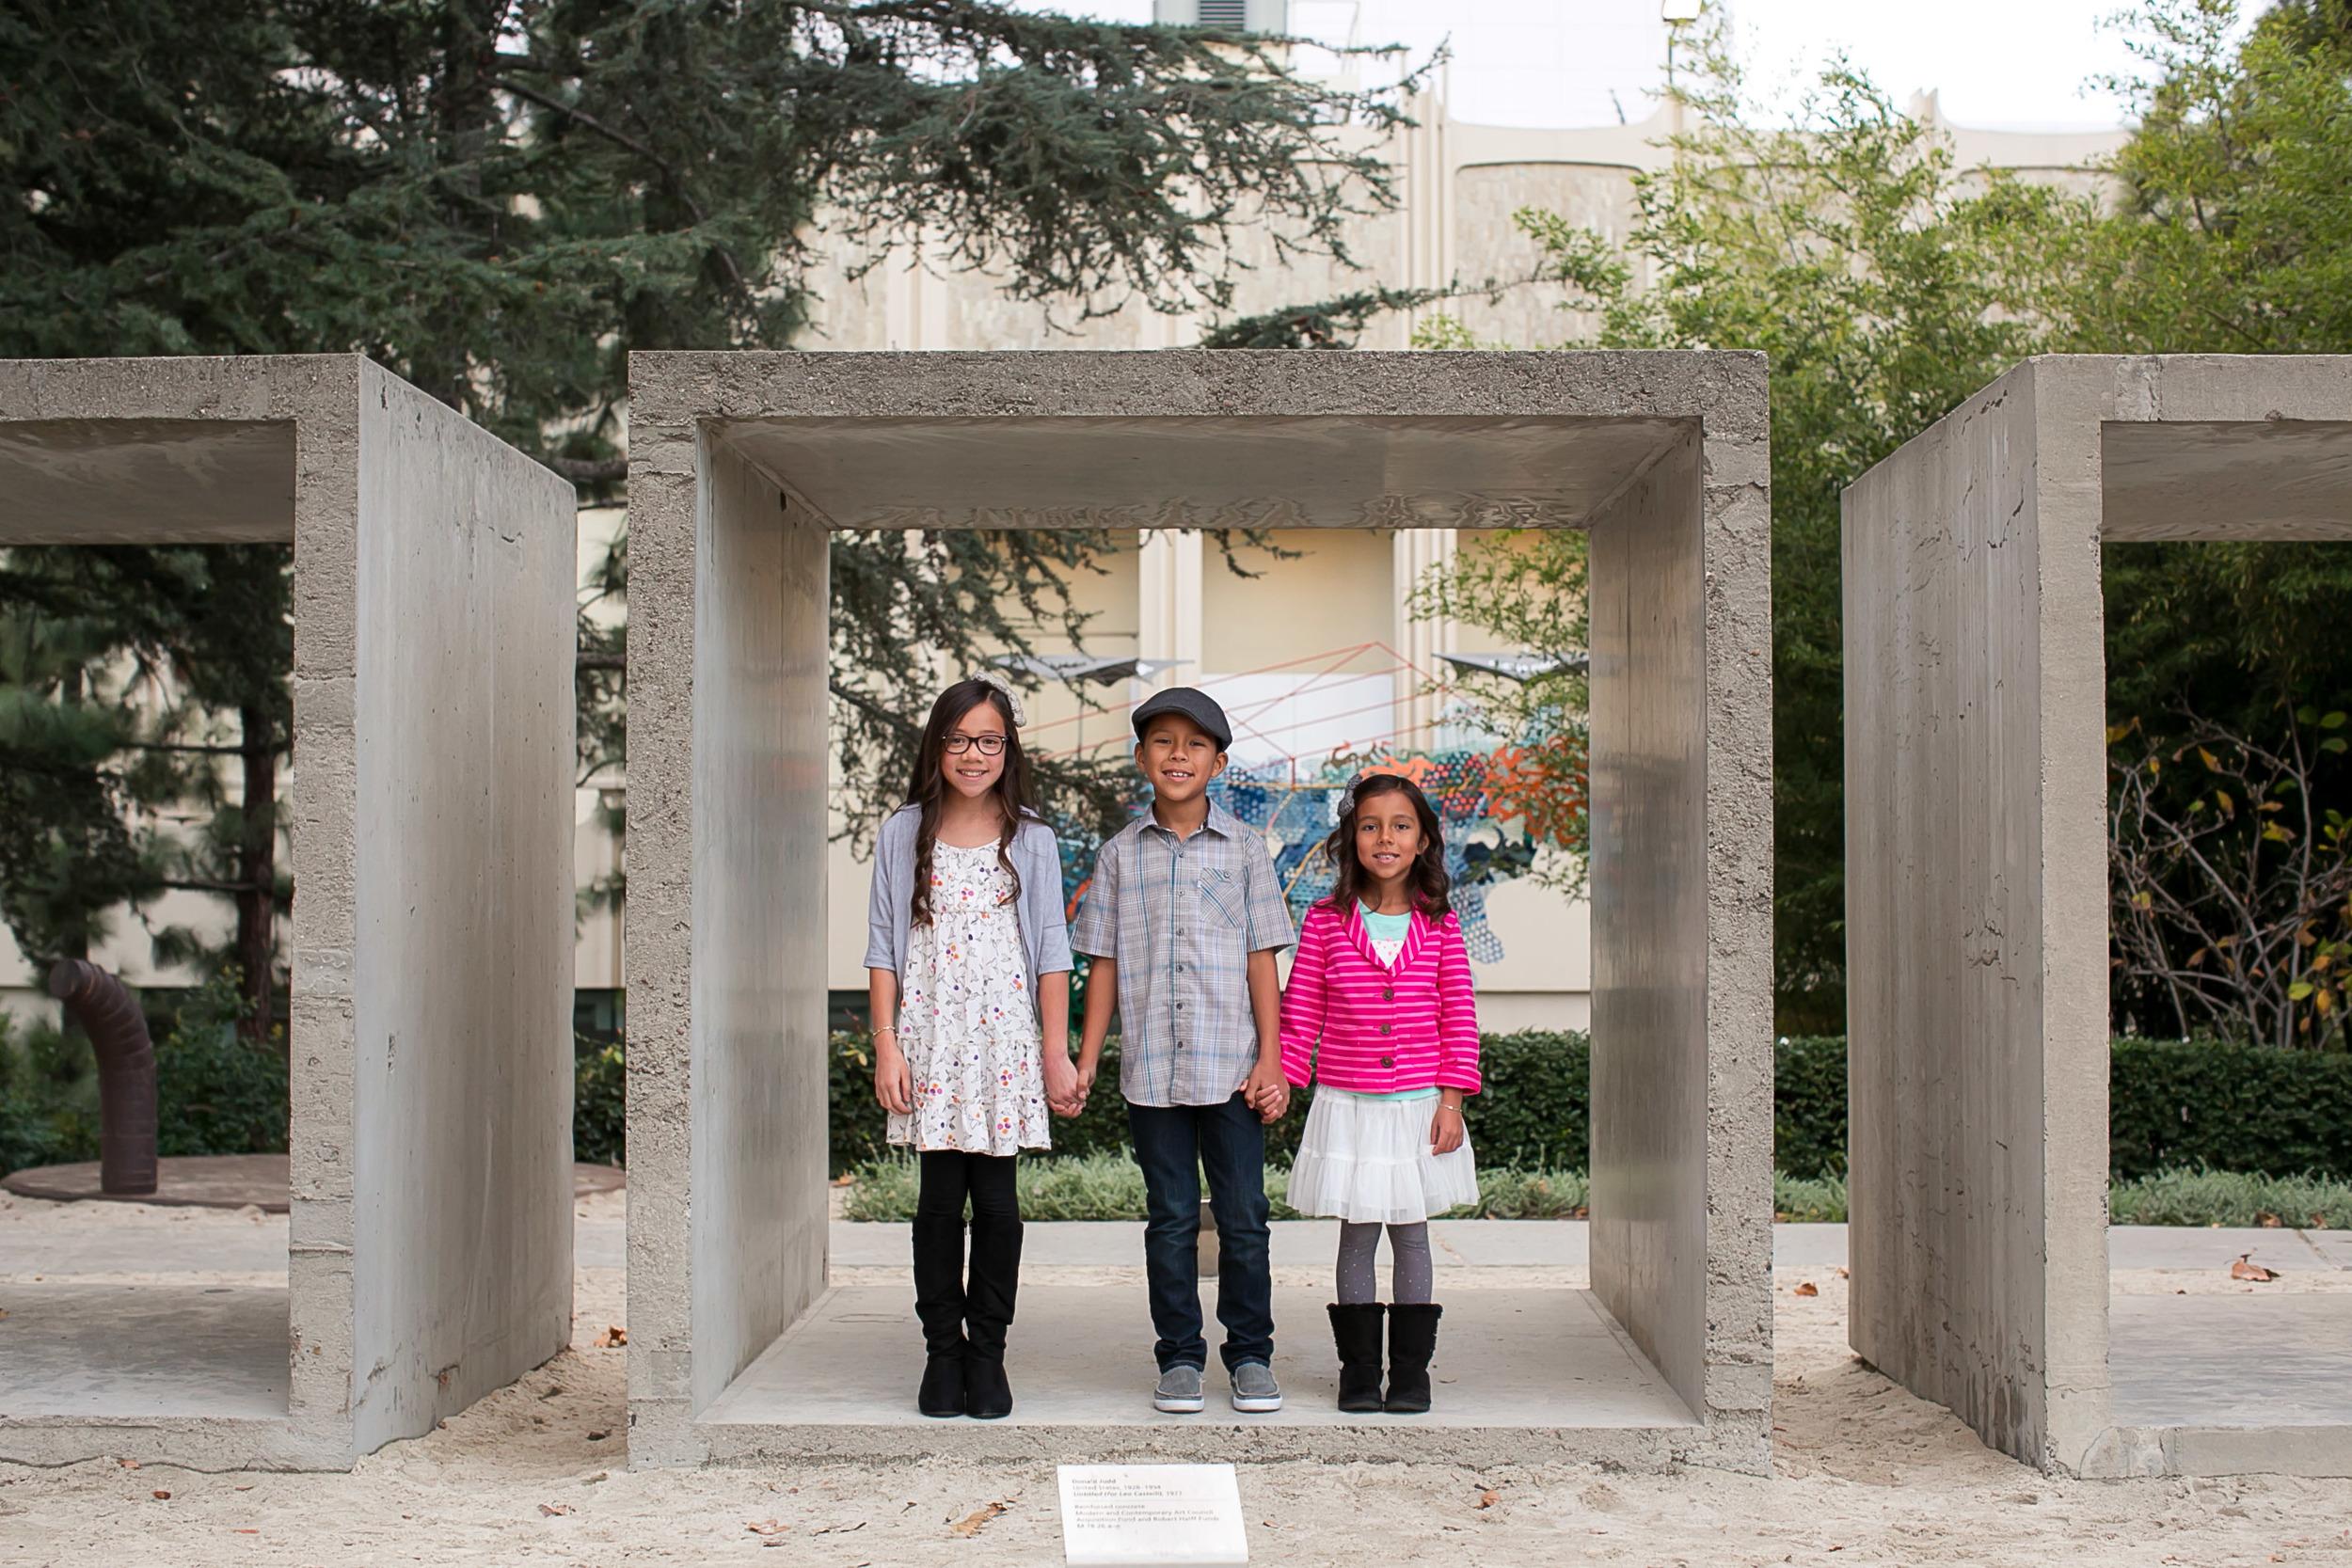 LACMA: LA Museum of Art // Los Angeles, Ca.